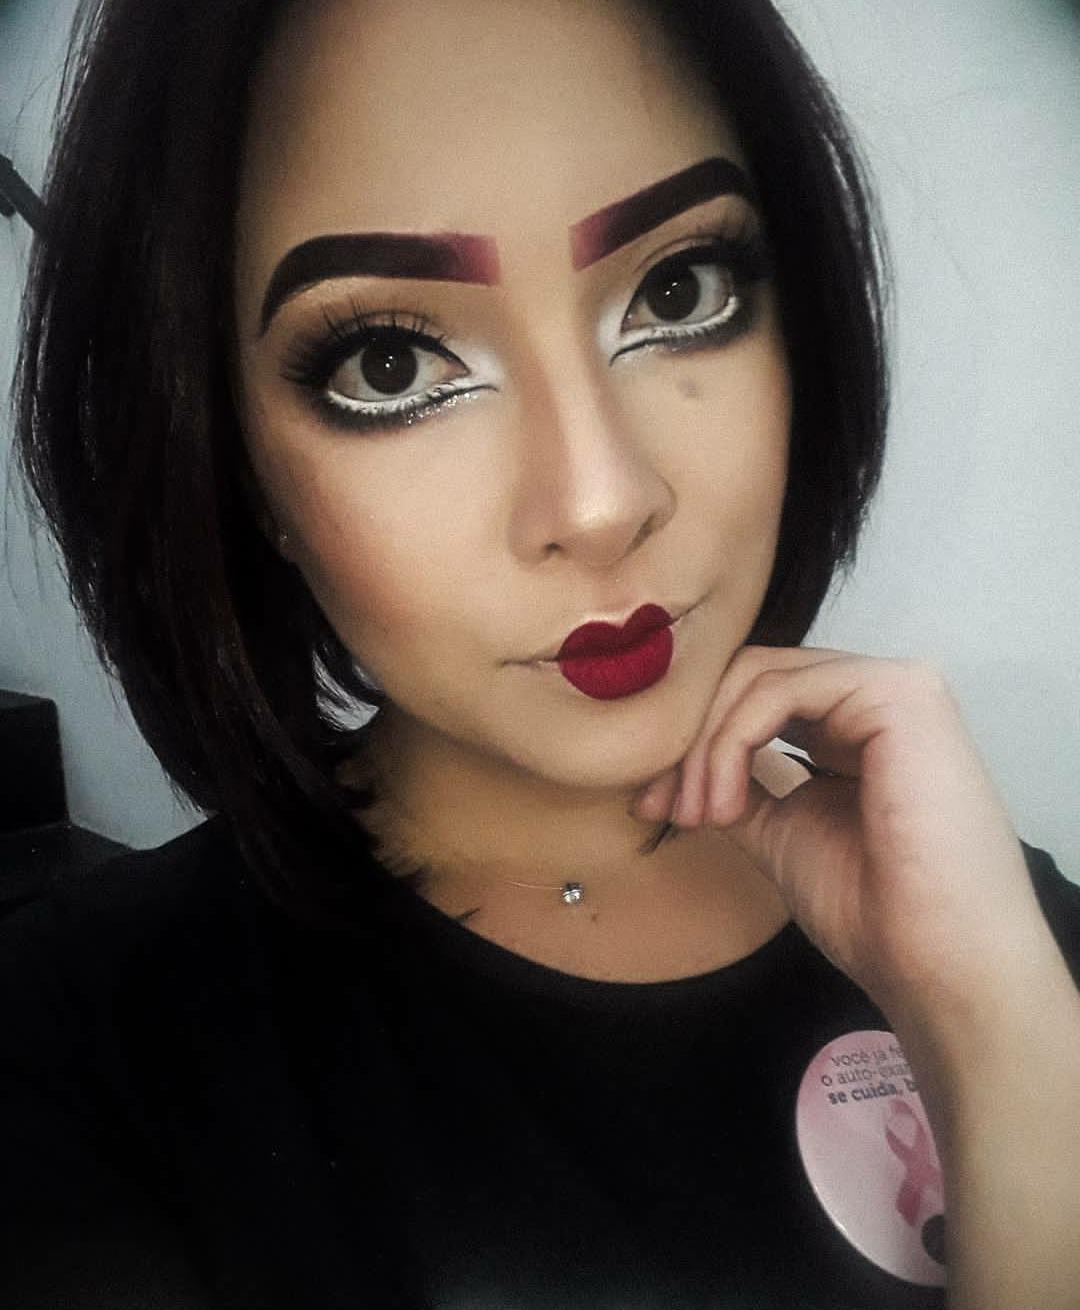 #makeup #makeupeditorial #lovemakeup #makemagazine #beauty #woman #beautygirl #maquiagem #maquiagemeditorial #amomaquiagem #maquiagemderevista #beleza #mulher #belezafeminina #makenoiva #makemadrinha #makeformanda #noivas #madrinhas #formanda #makebrasil #makesp #makeartistica #boneca #makeboneca maquiagem maquiador(a)